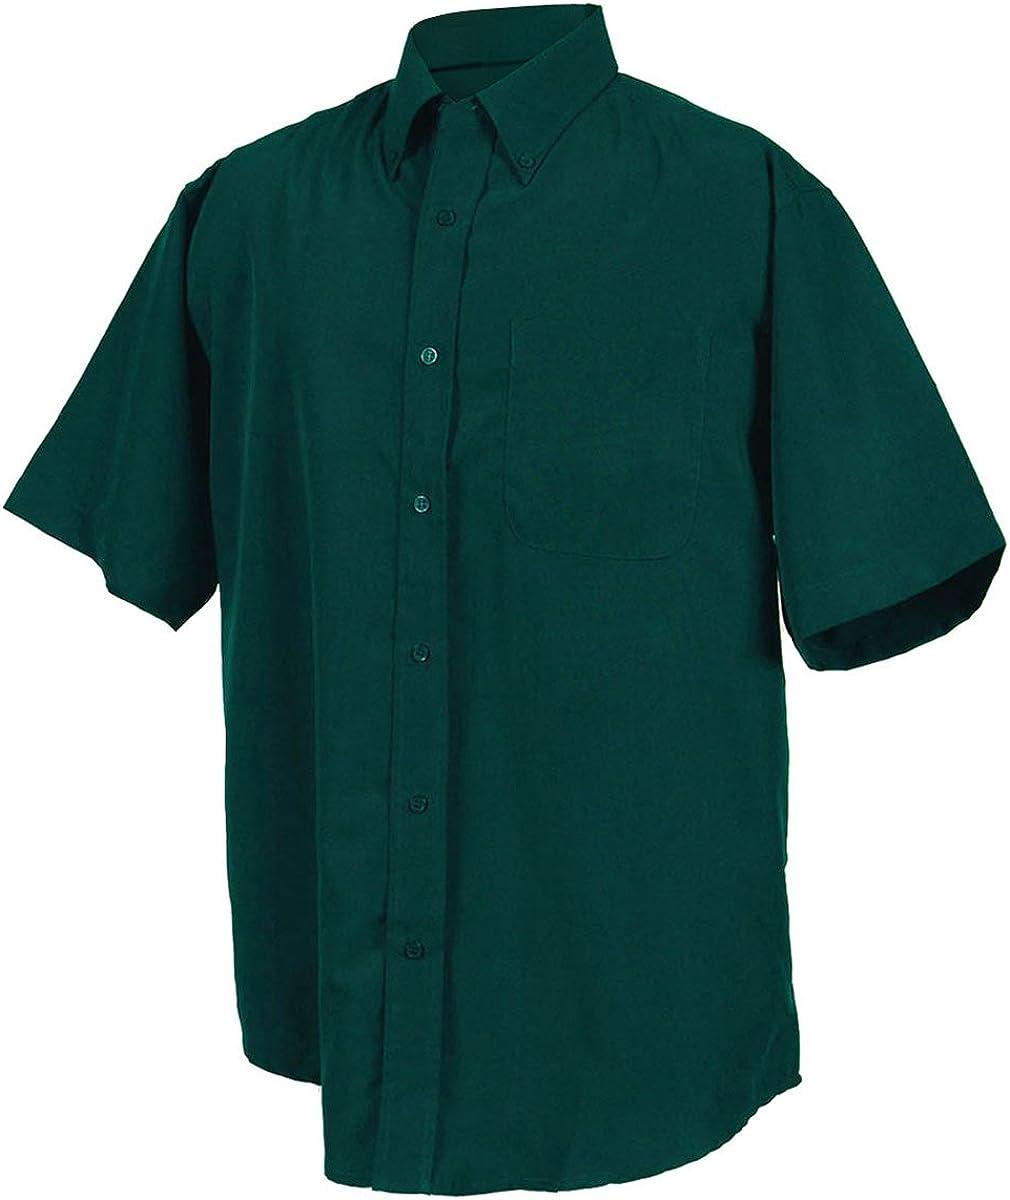 Tri Mountain 5 oz. Wrinkle-Resistant 858 Fashion Rayon 5 ☆ popular Woven Shirt. Poly